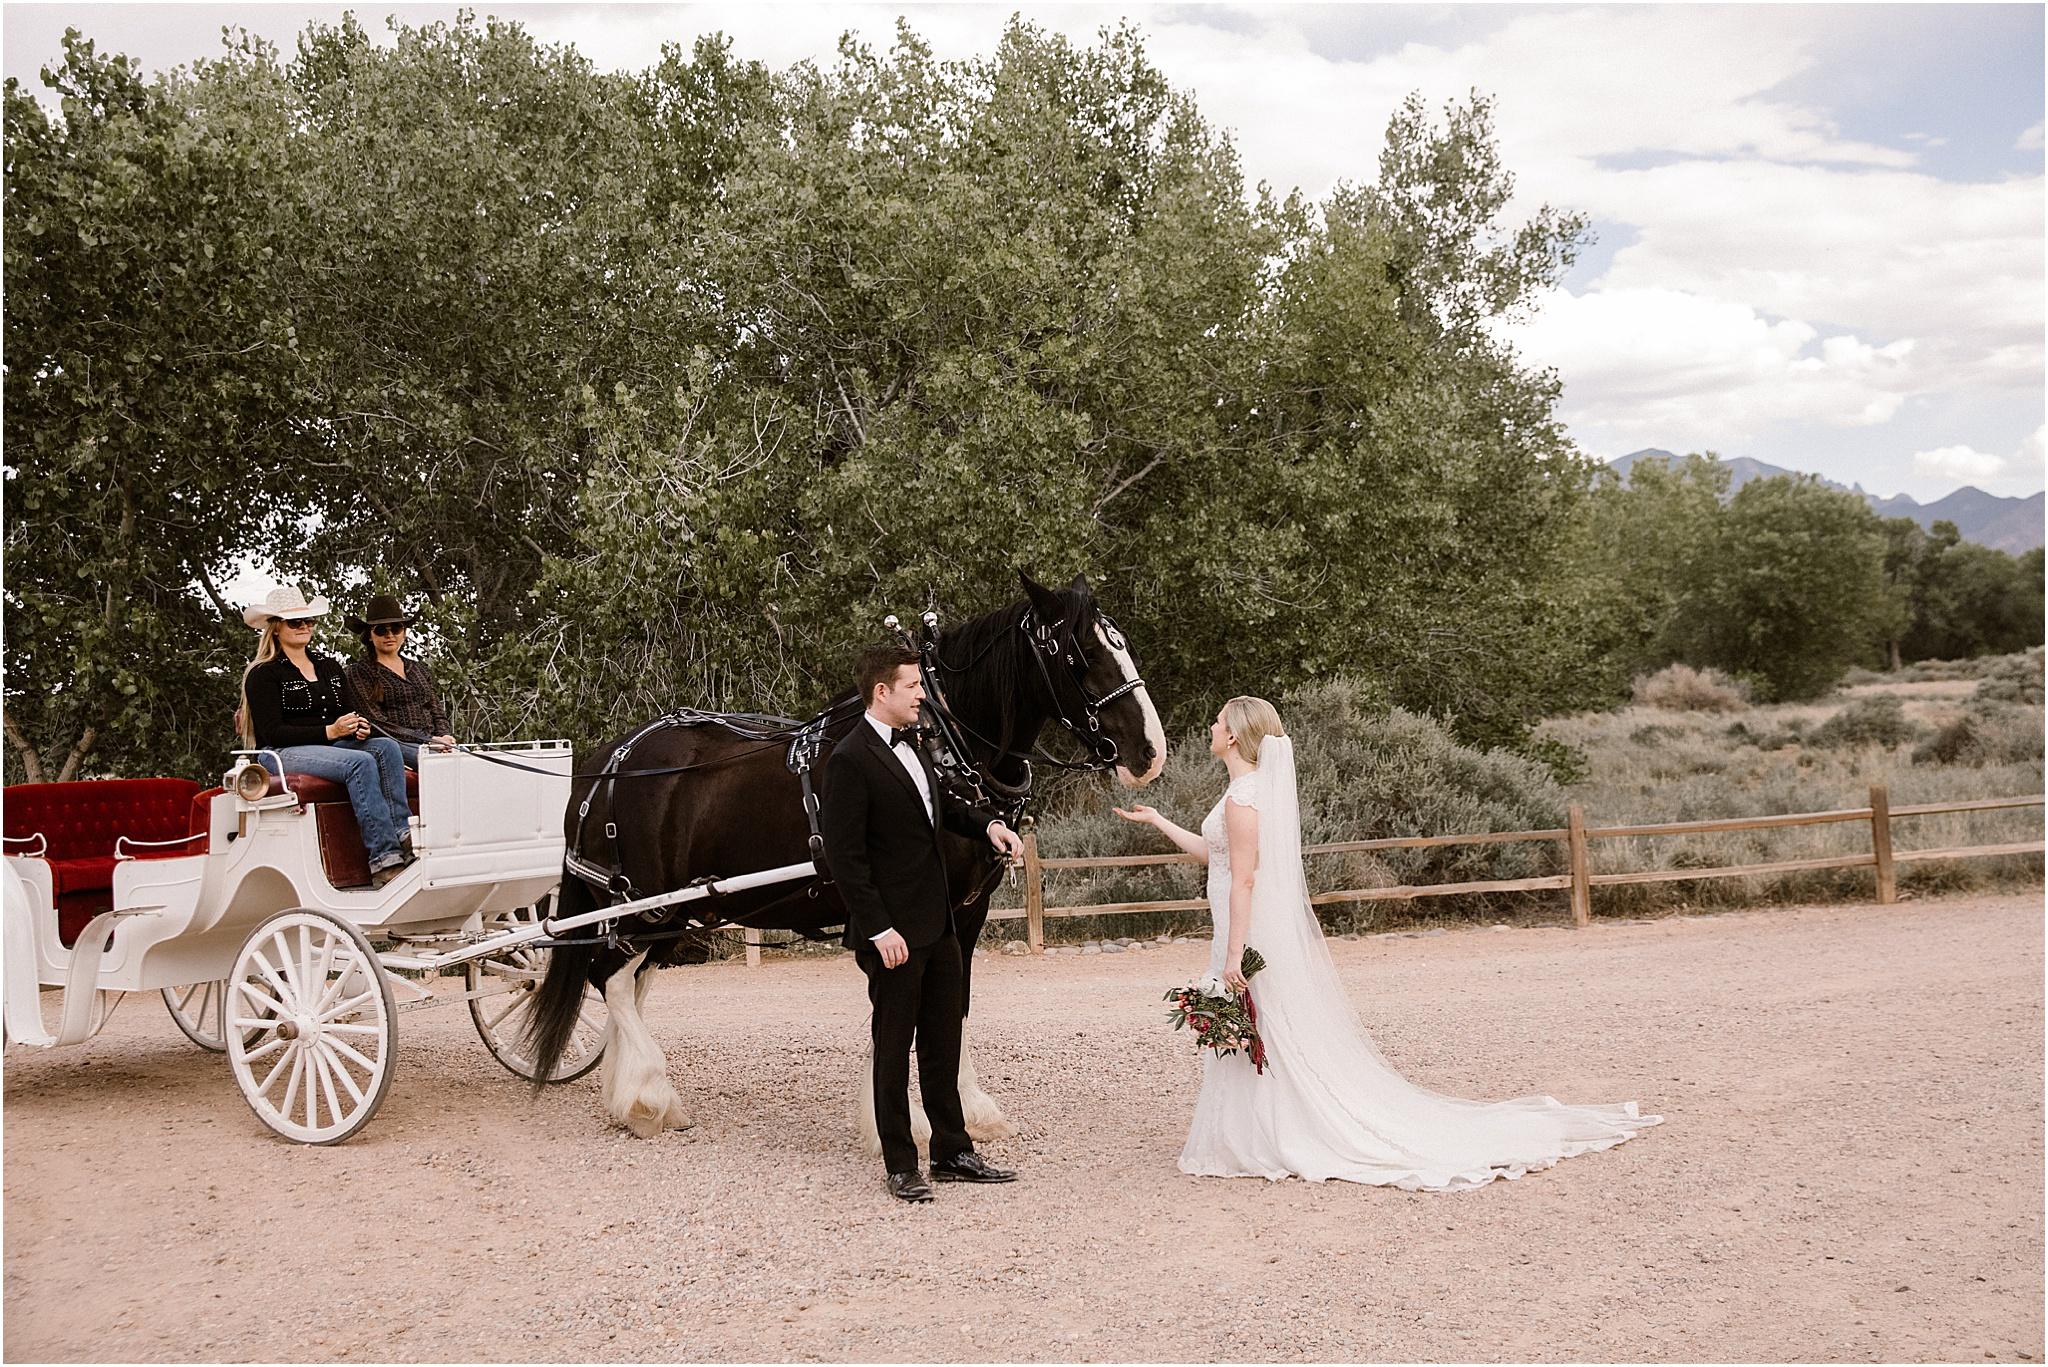 JENNA_JEROME_BLUE ROSE PHOTOGRAPHY_ABQ WEDDING_38